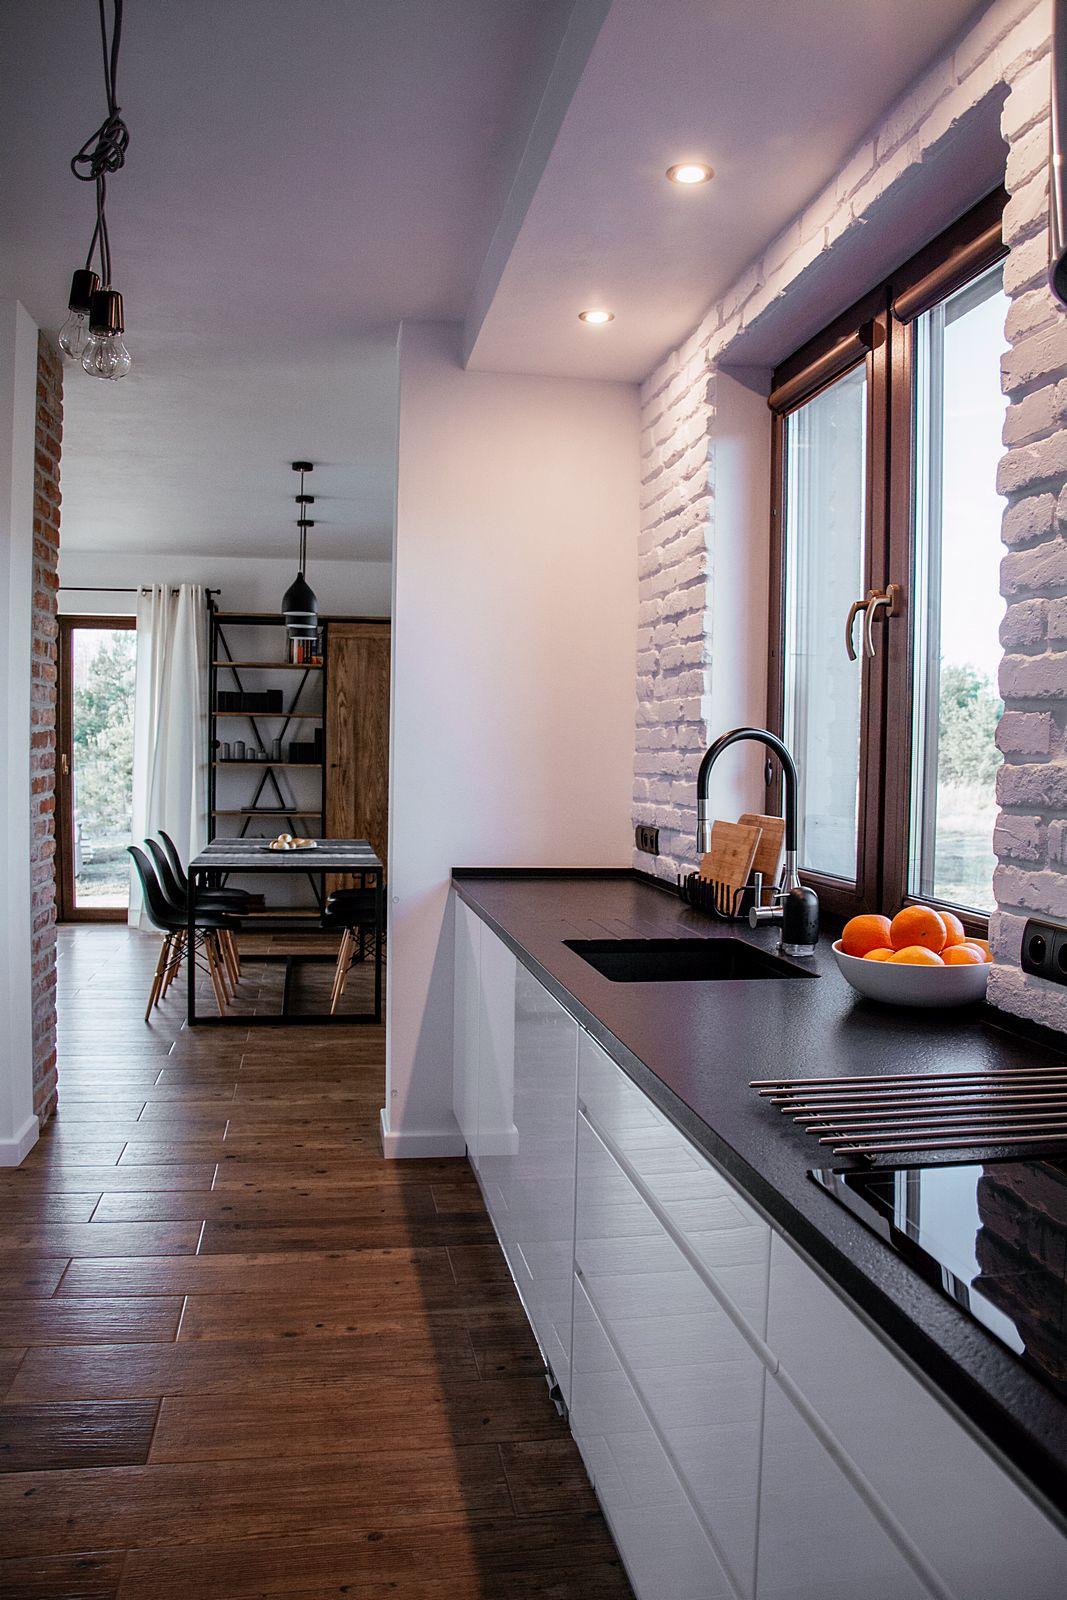 Zdjecie Kuchnia W Nowoczesnym Stylu Farmhouse Kitchen Design Home Kitchens Kitchen Design